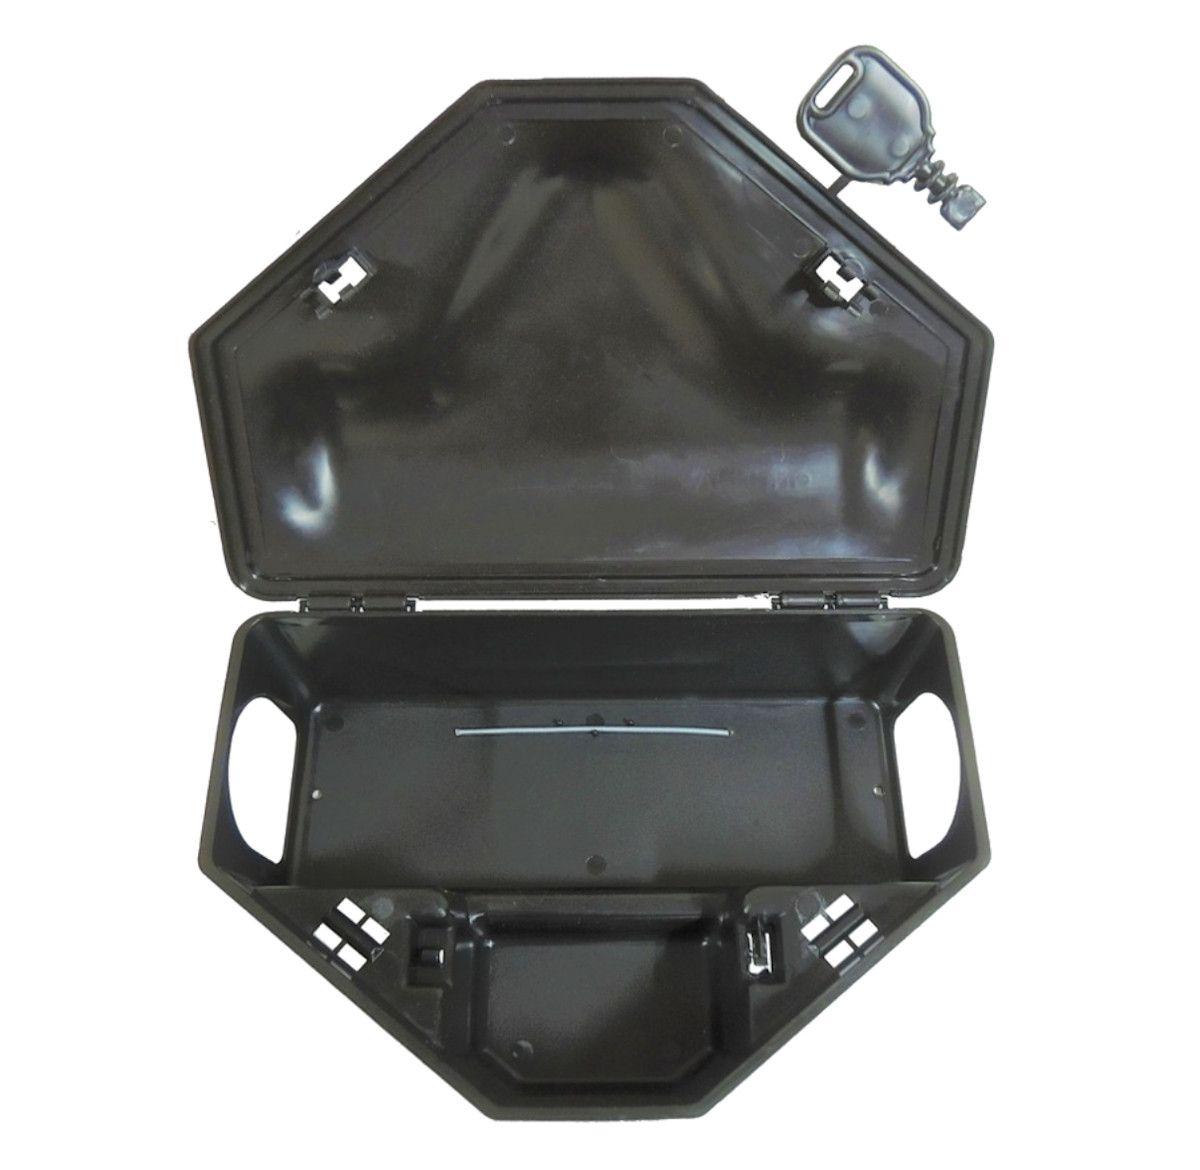 Kit 7 Porta Isca C/ 2 Chaves + 7 Bloco Extrusado Mata Seca